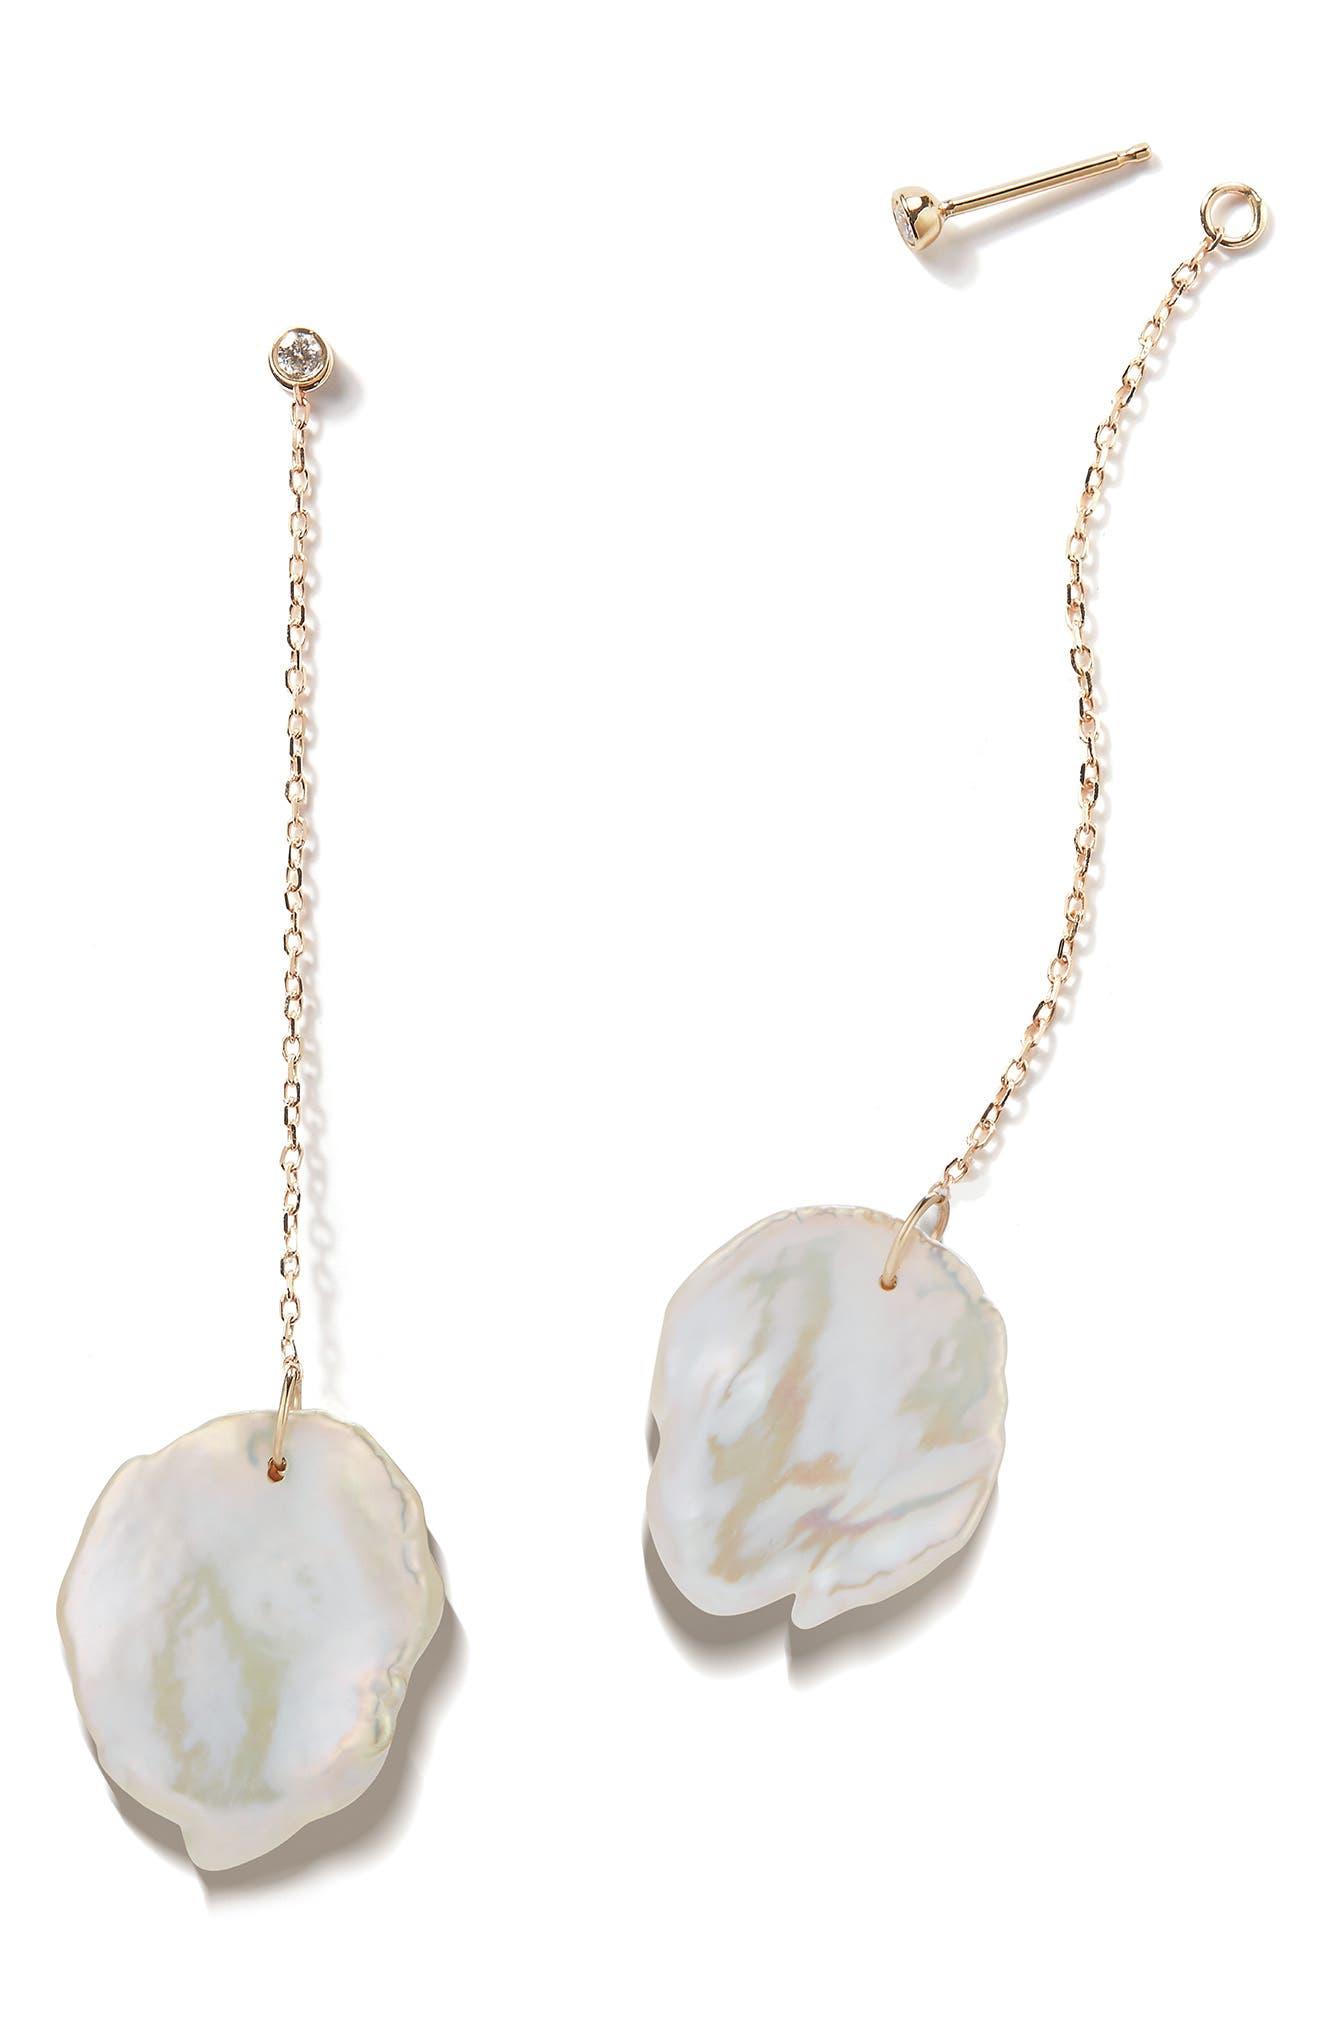 Flat Pearl & Diamond Linear Drop Earrings,                             Alternate thumbnail 3, color,                             Yellow Gold/ Pearl